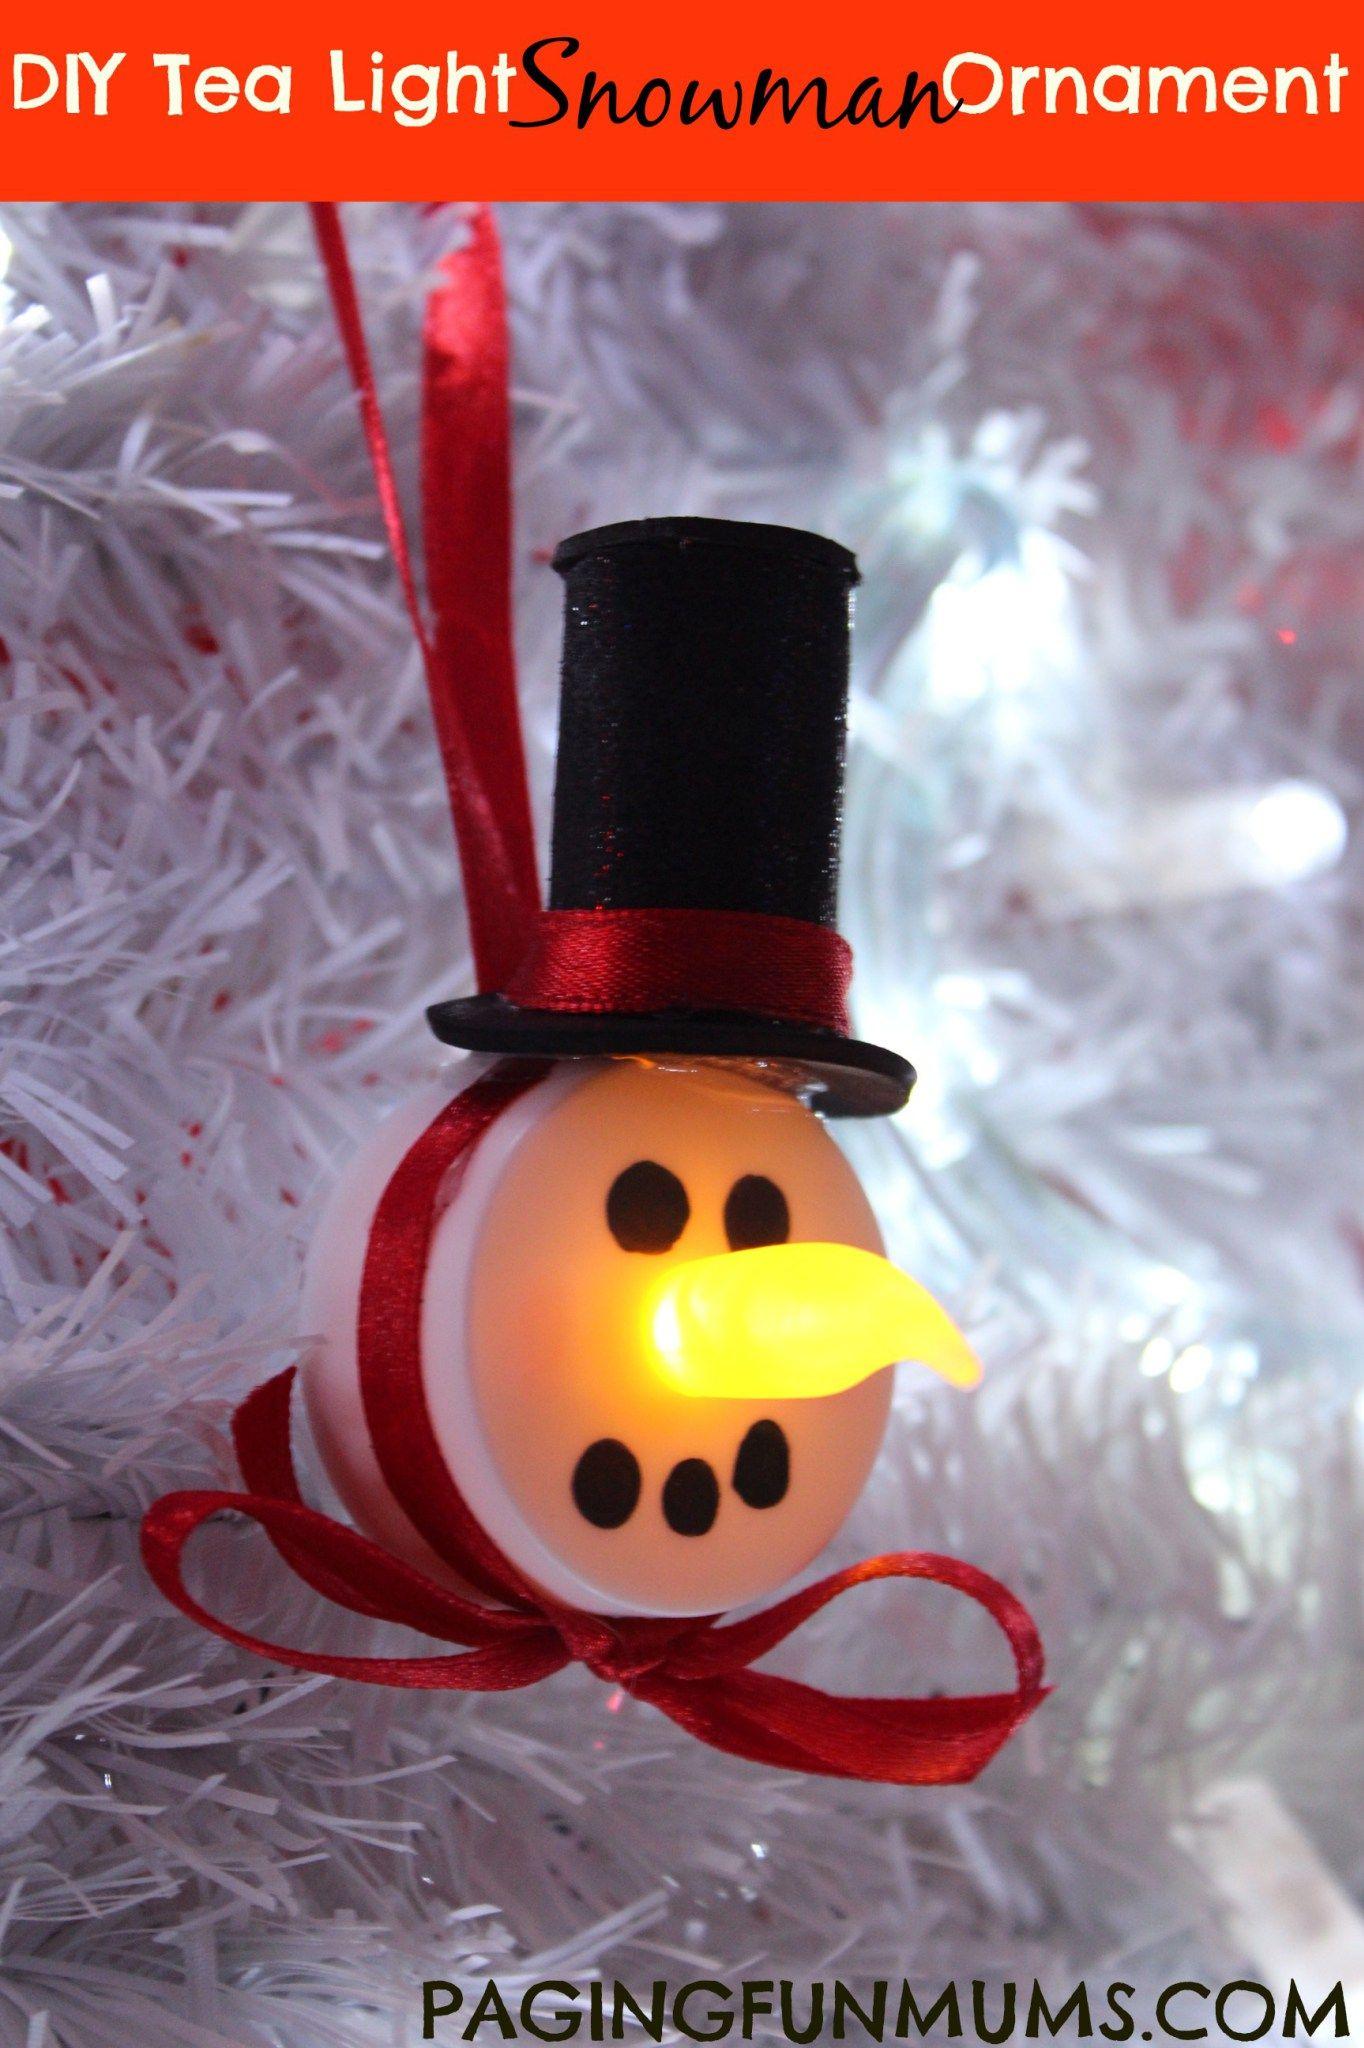 Tea Light Snowman Ornament Paging Fun Mums Tea Light Snowman Christmas Bazaar Ideas Xmas Crafts